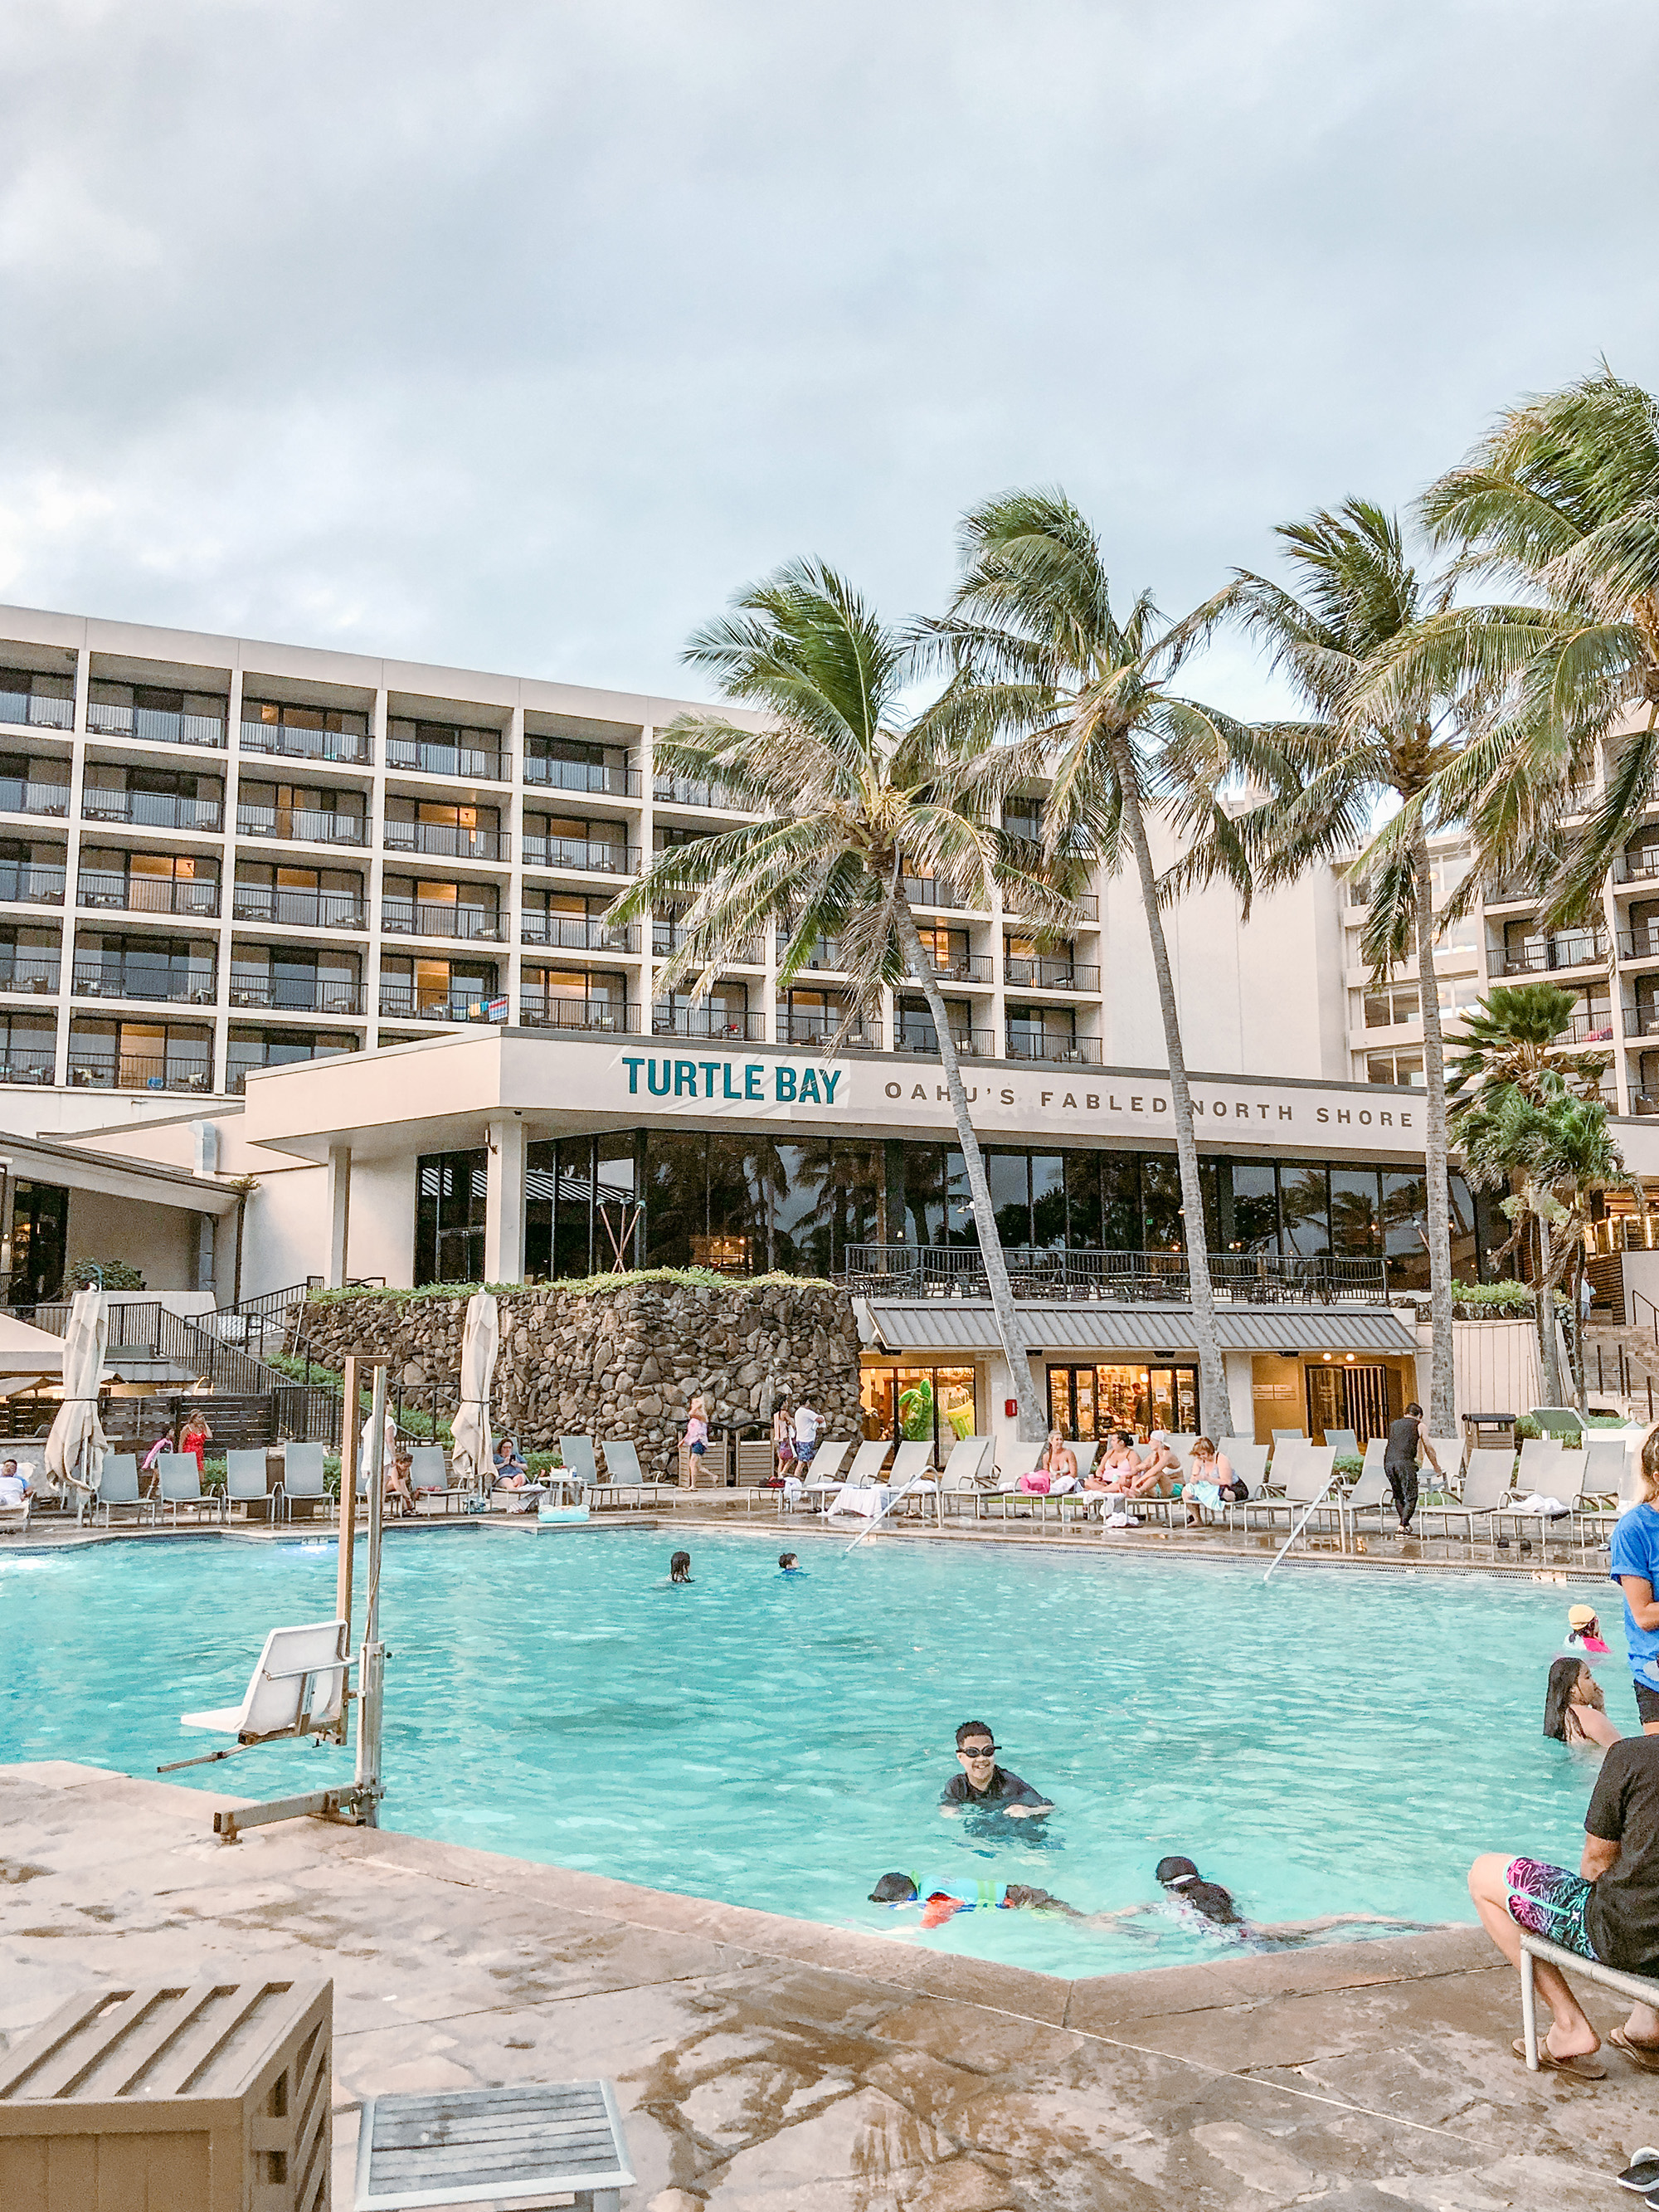 Turtle Bay Resort in North Shore Oahu Hawaii